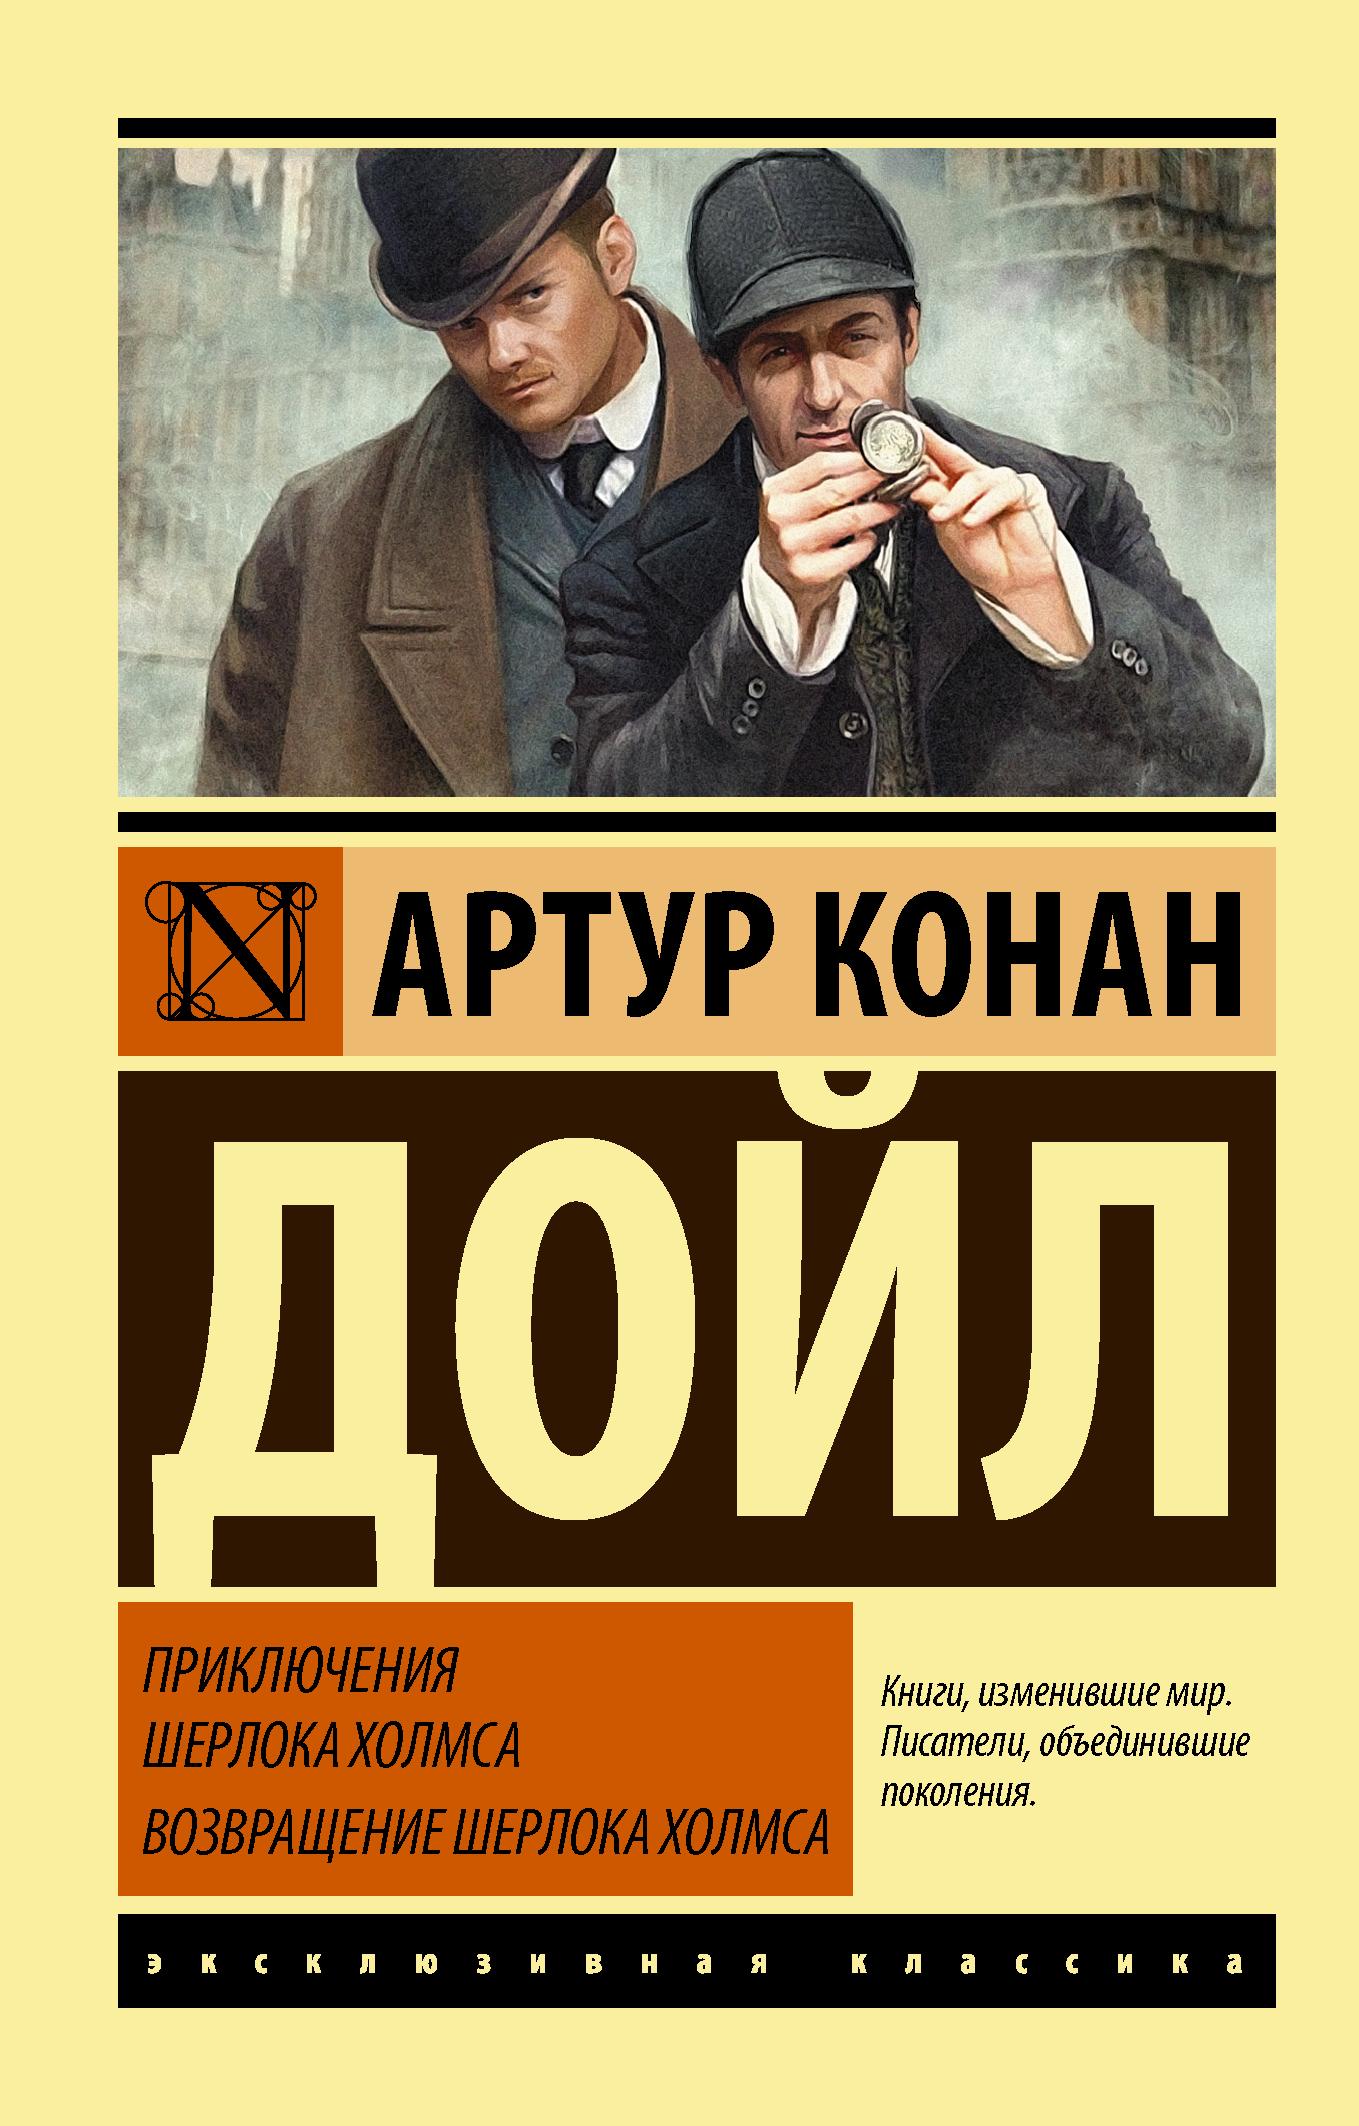 Артур Конан Дойл Приключения Шерлока Холмса. Возвращение Шерлока Холмса